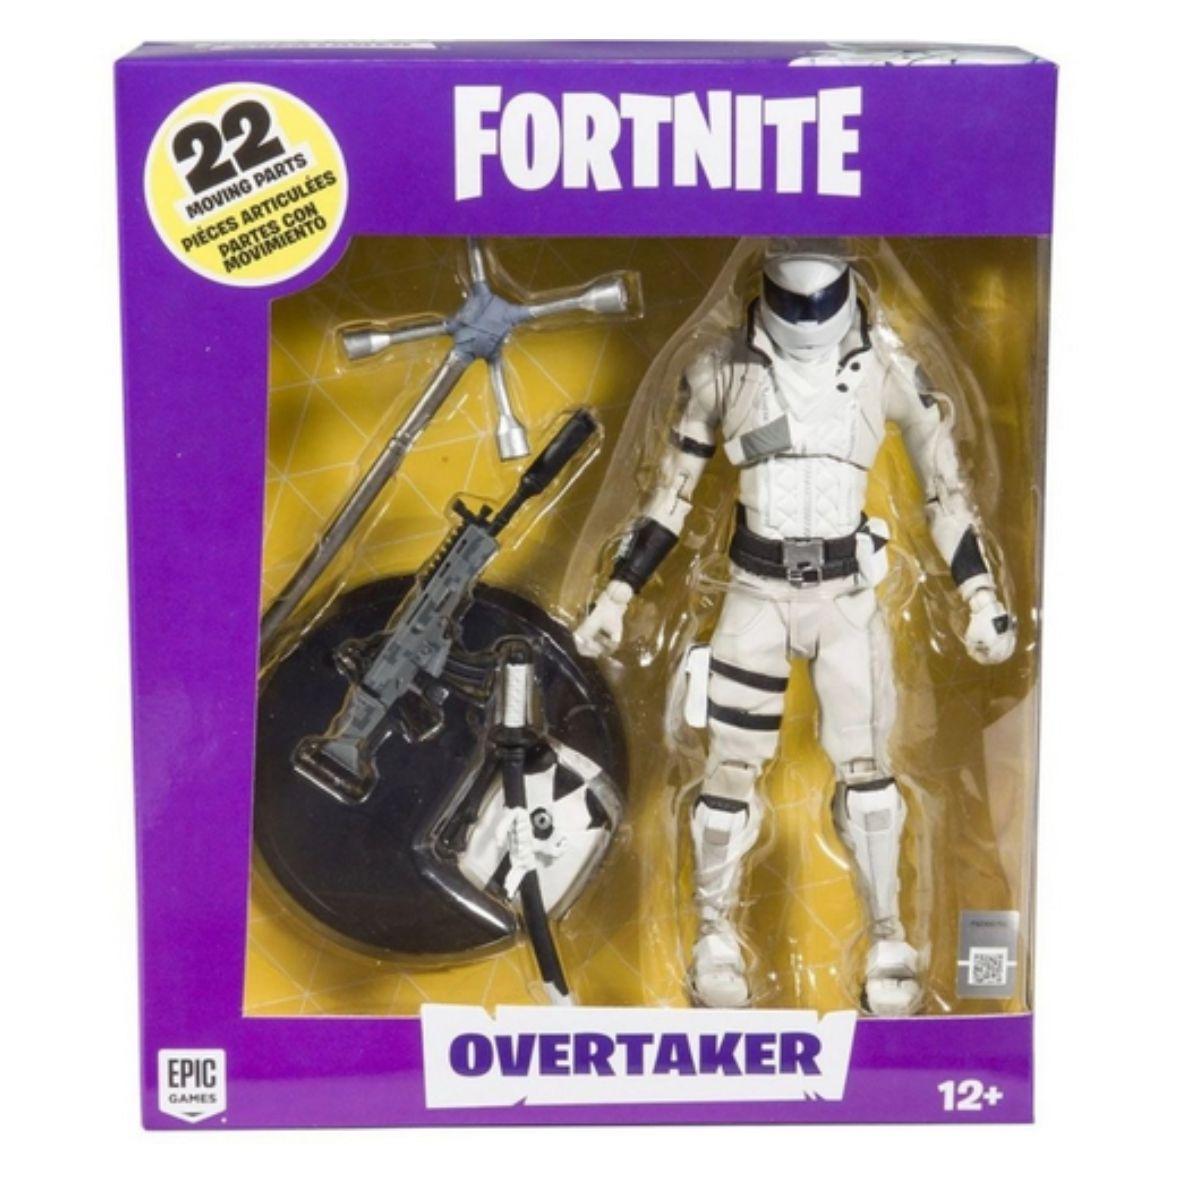 Boneco Articulado Fortnite Overtaker 35 cm - Fun